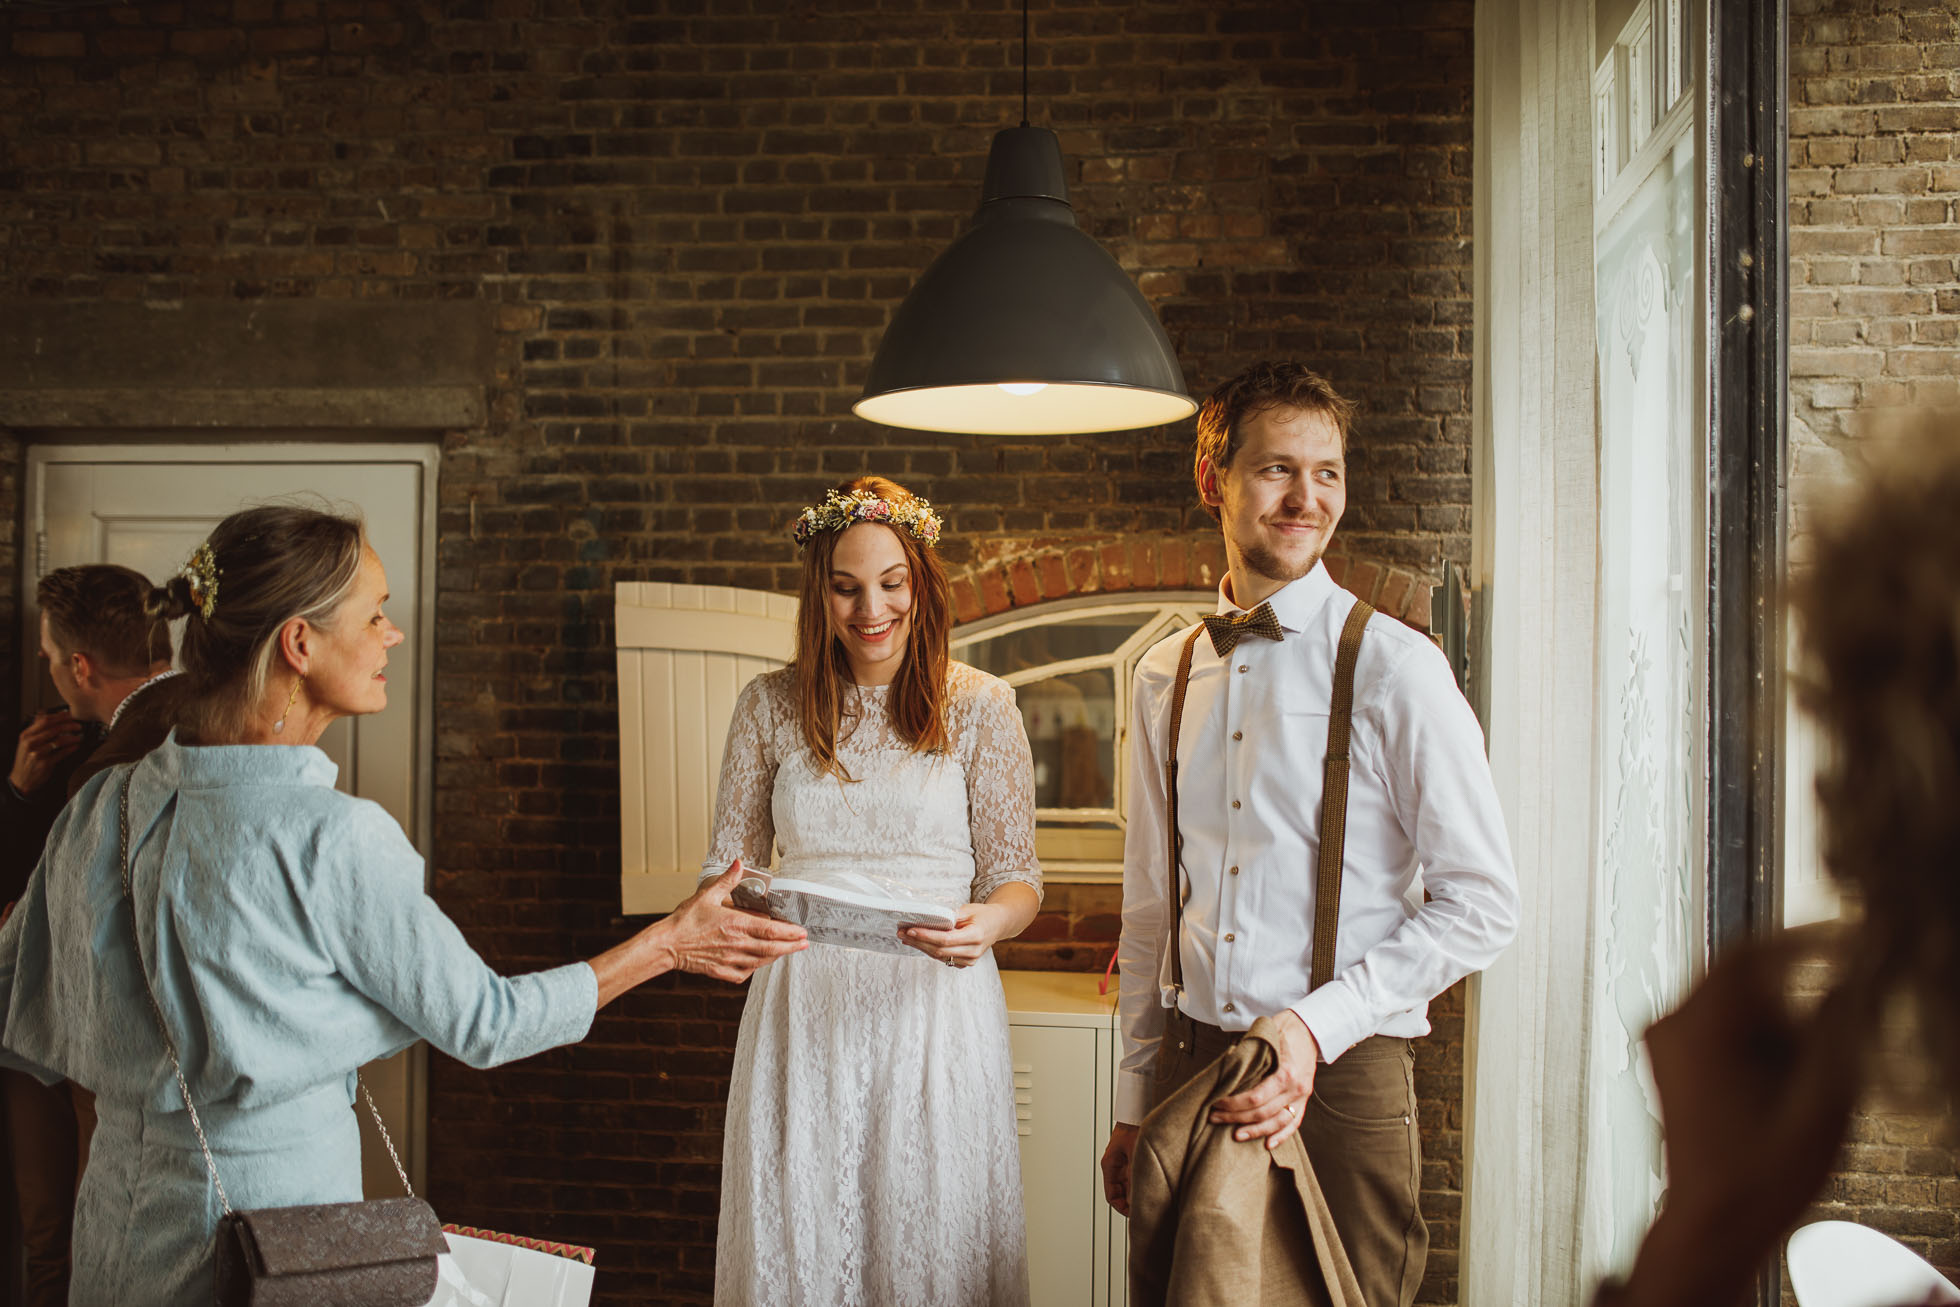 utrecht-wedding-photographer-104.jpg